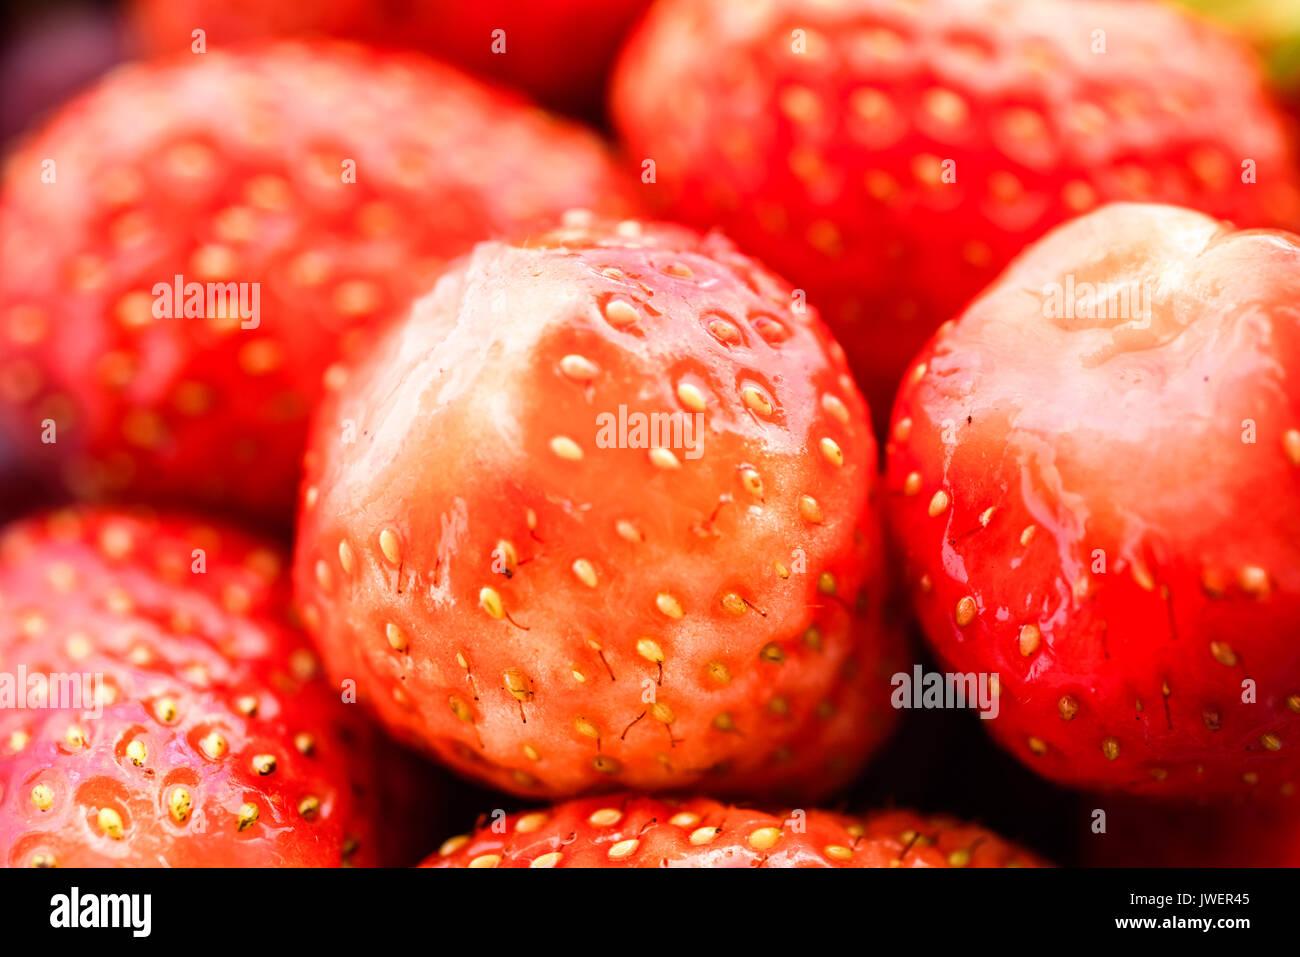 Strawberry Makro texture - Stock Image